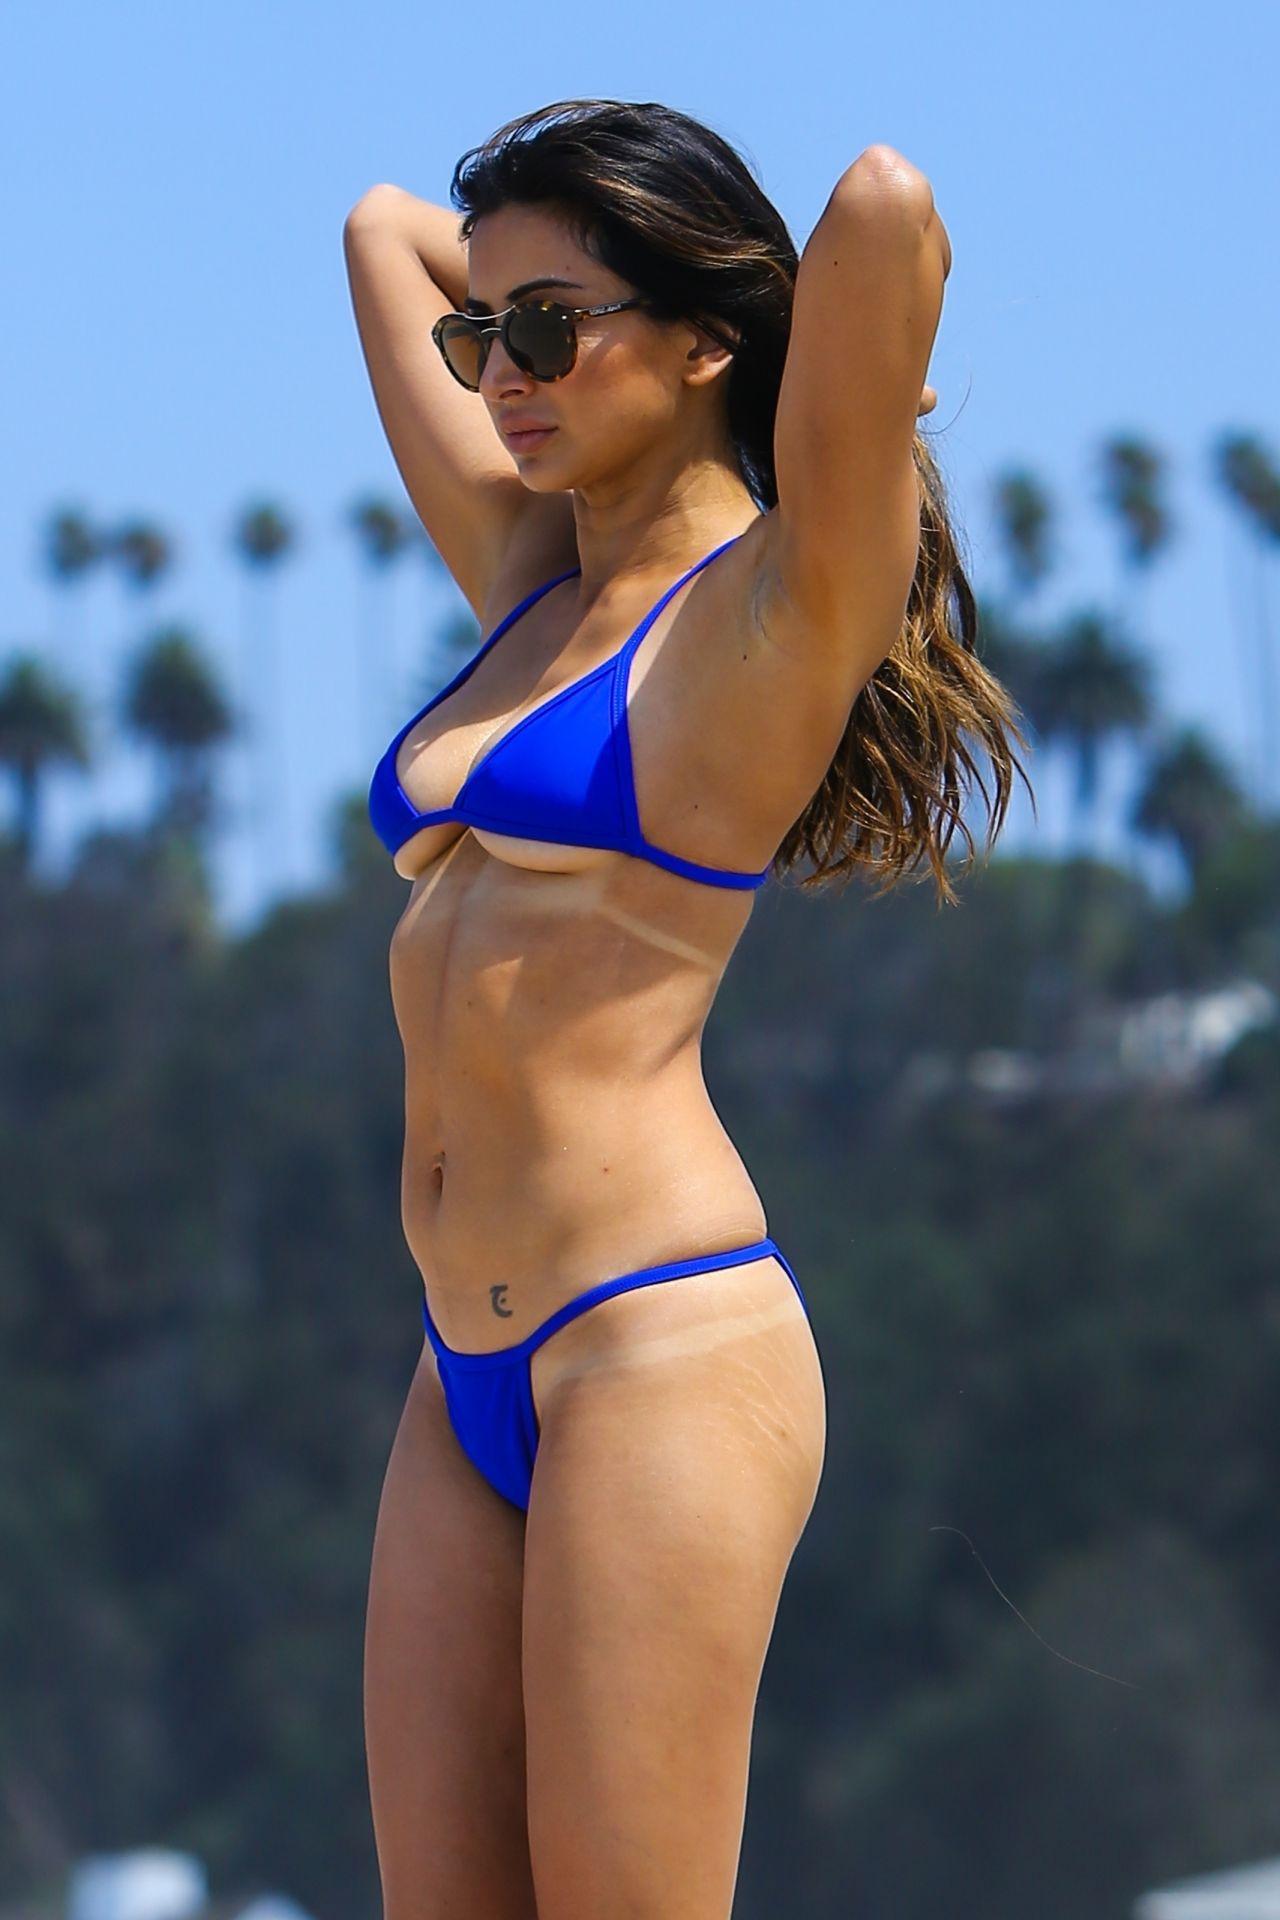 Noureen Dewulf In A Blue Bikini At The Beach In Santa -2333